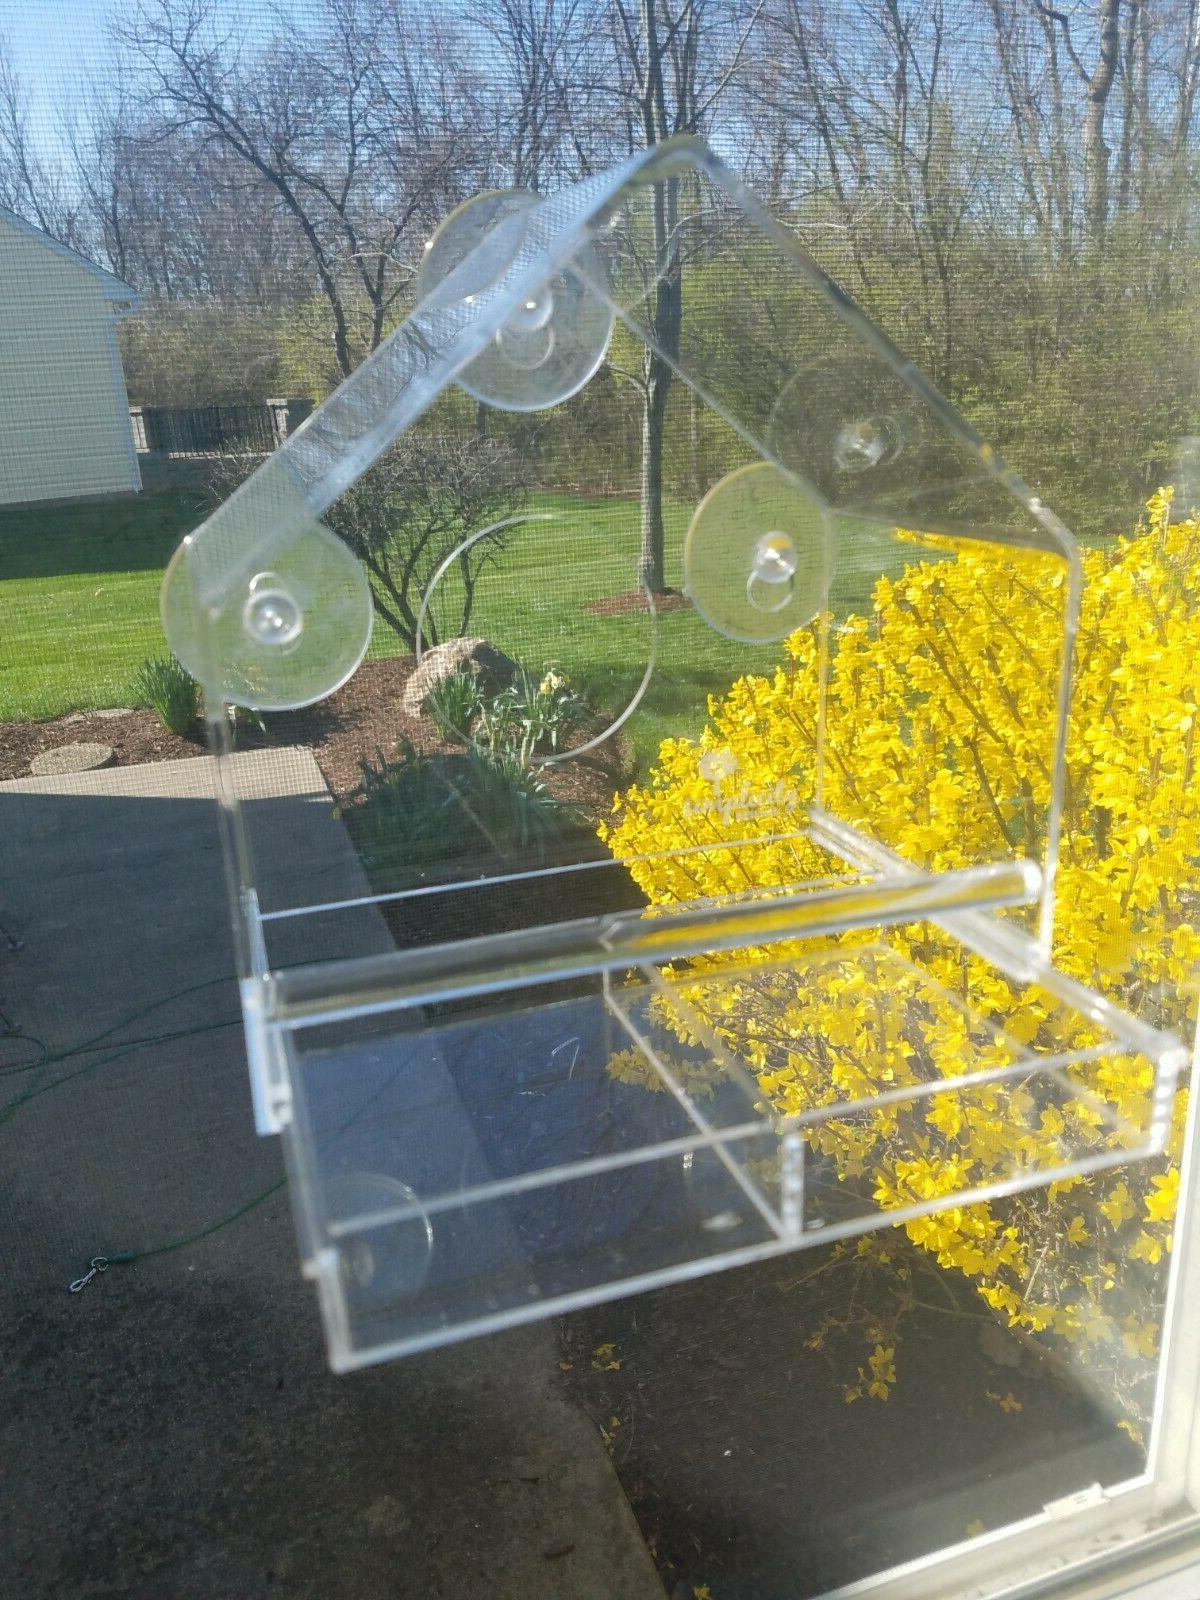 acrylic window bird feeder with removable tray